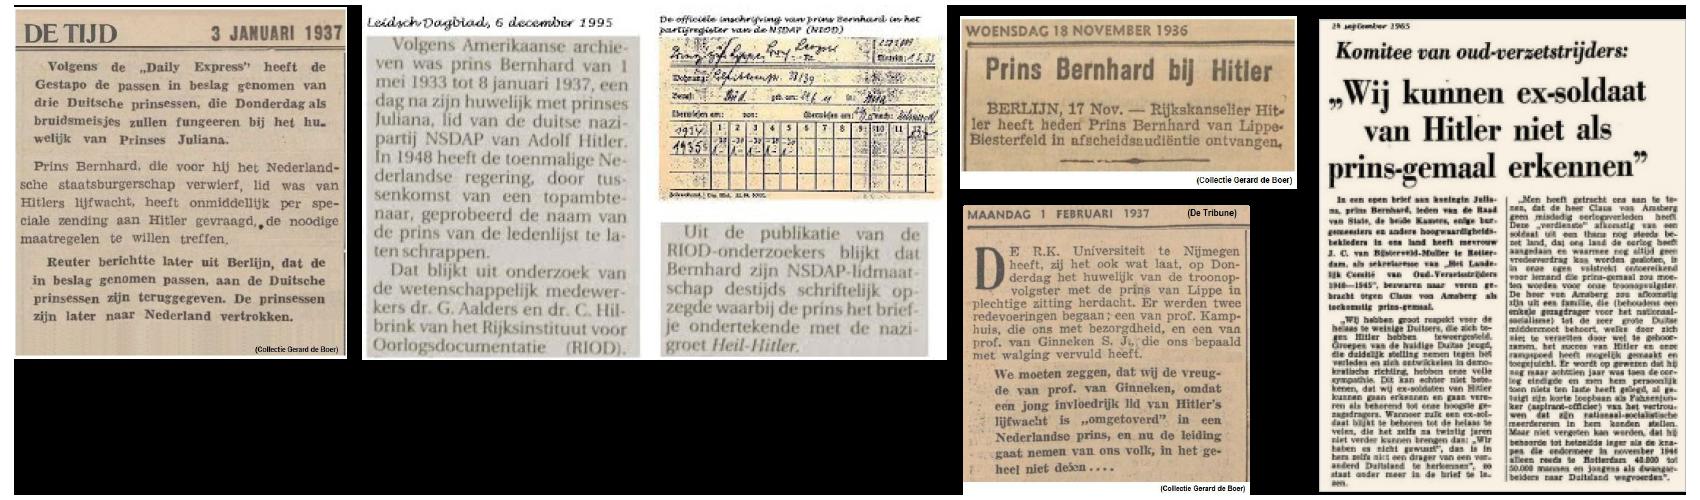 https://www.ellaster.nl/wp-content/uploads/2019/05/Prins_Bernhard_Hitlers_lijfwacht.png